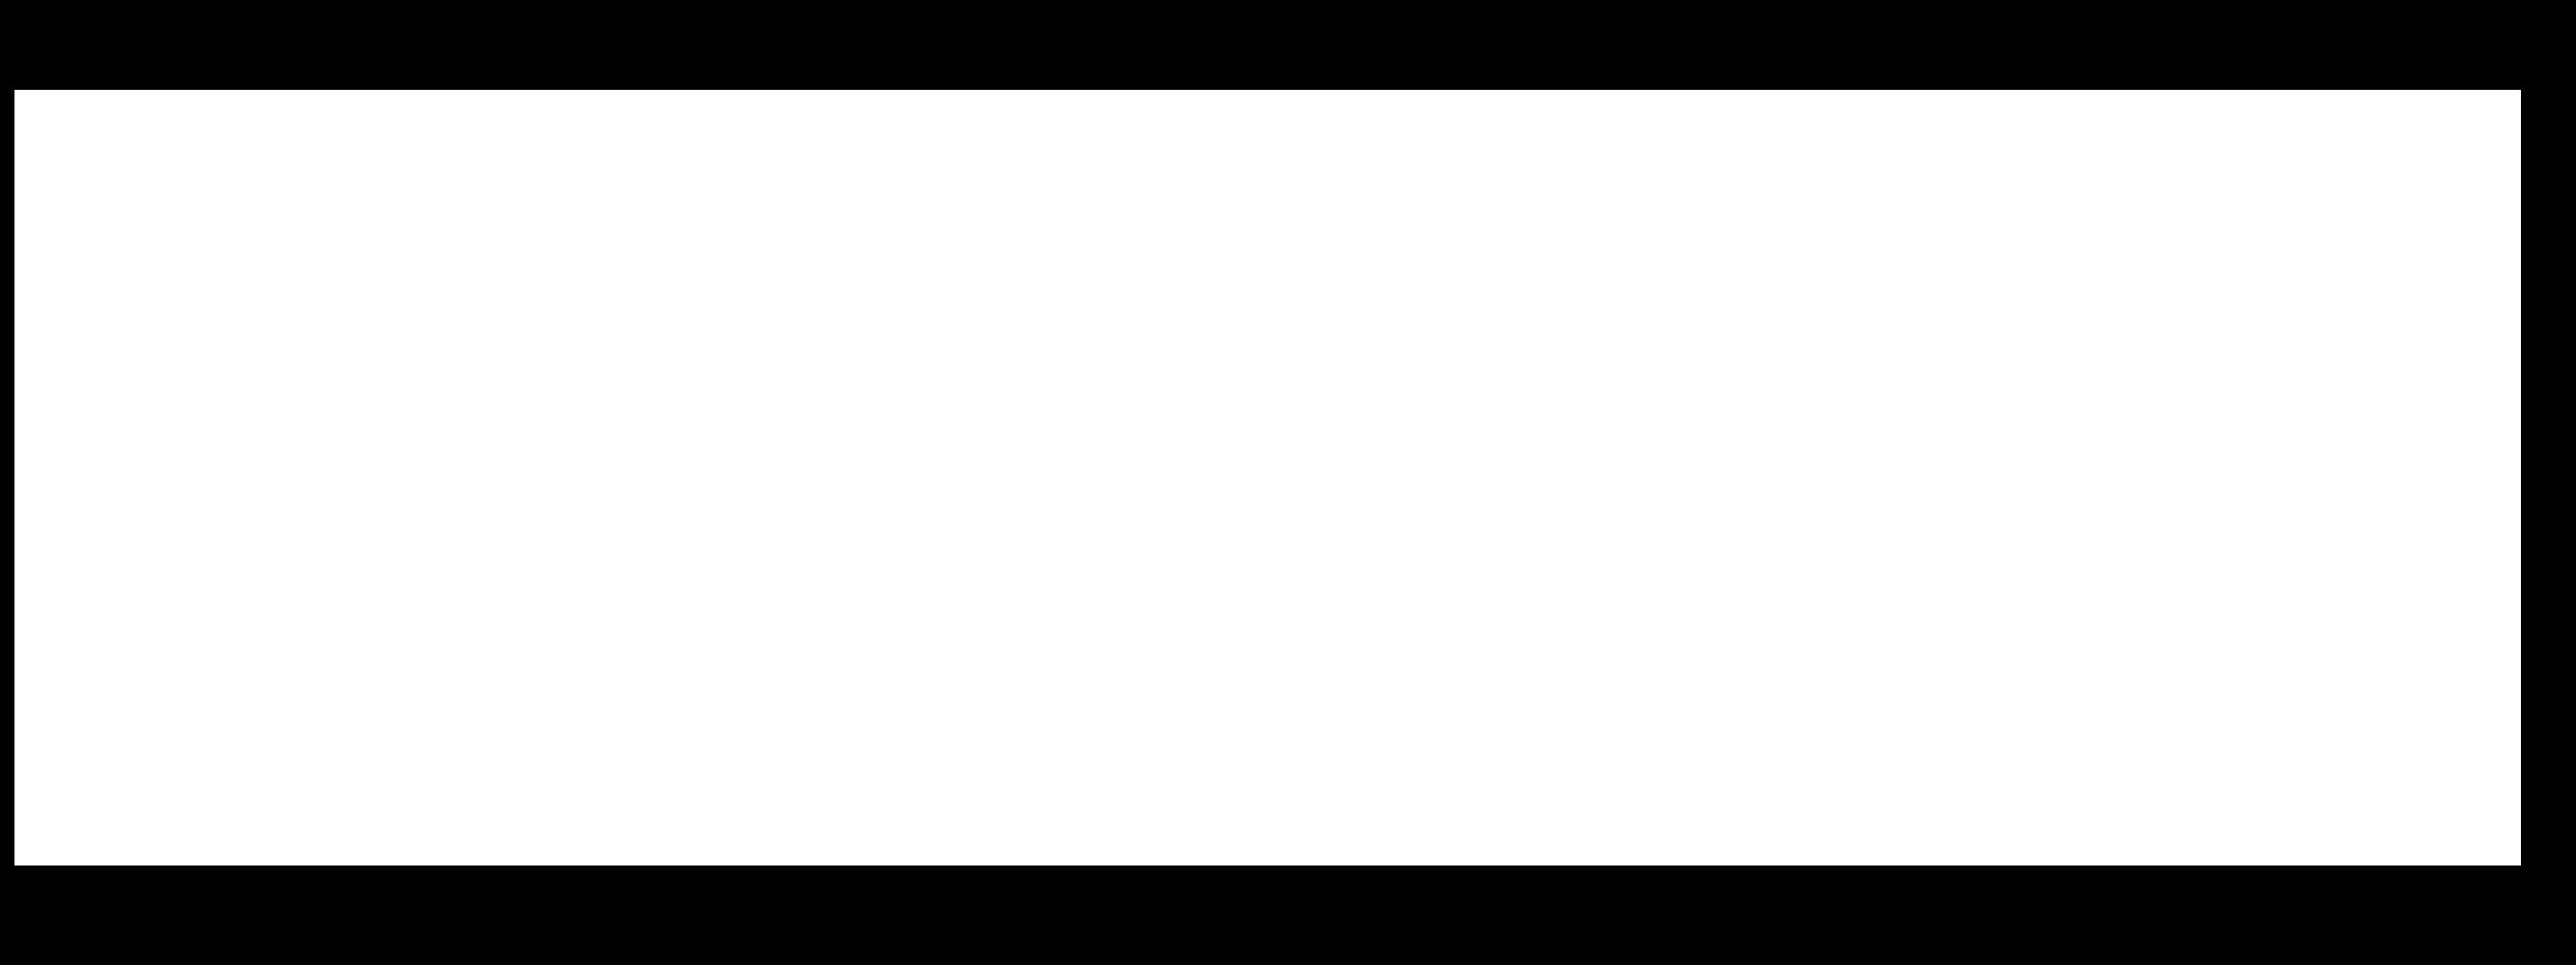 HRB_logo transparent white.png